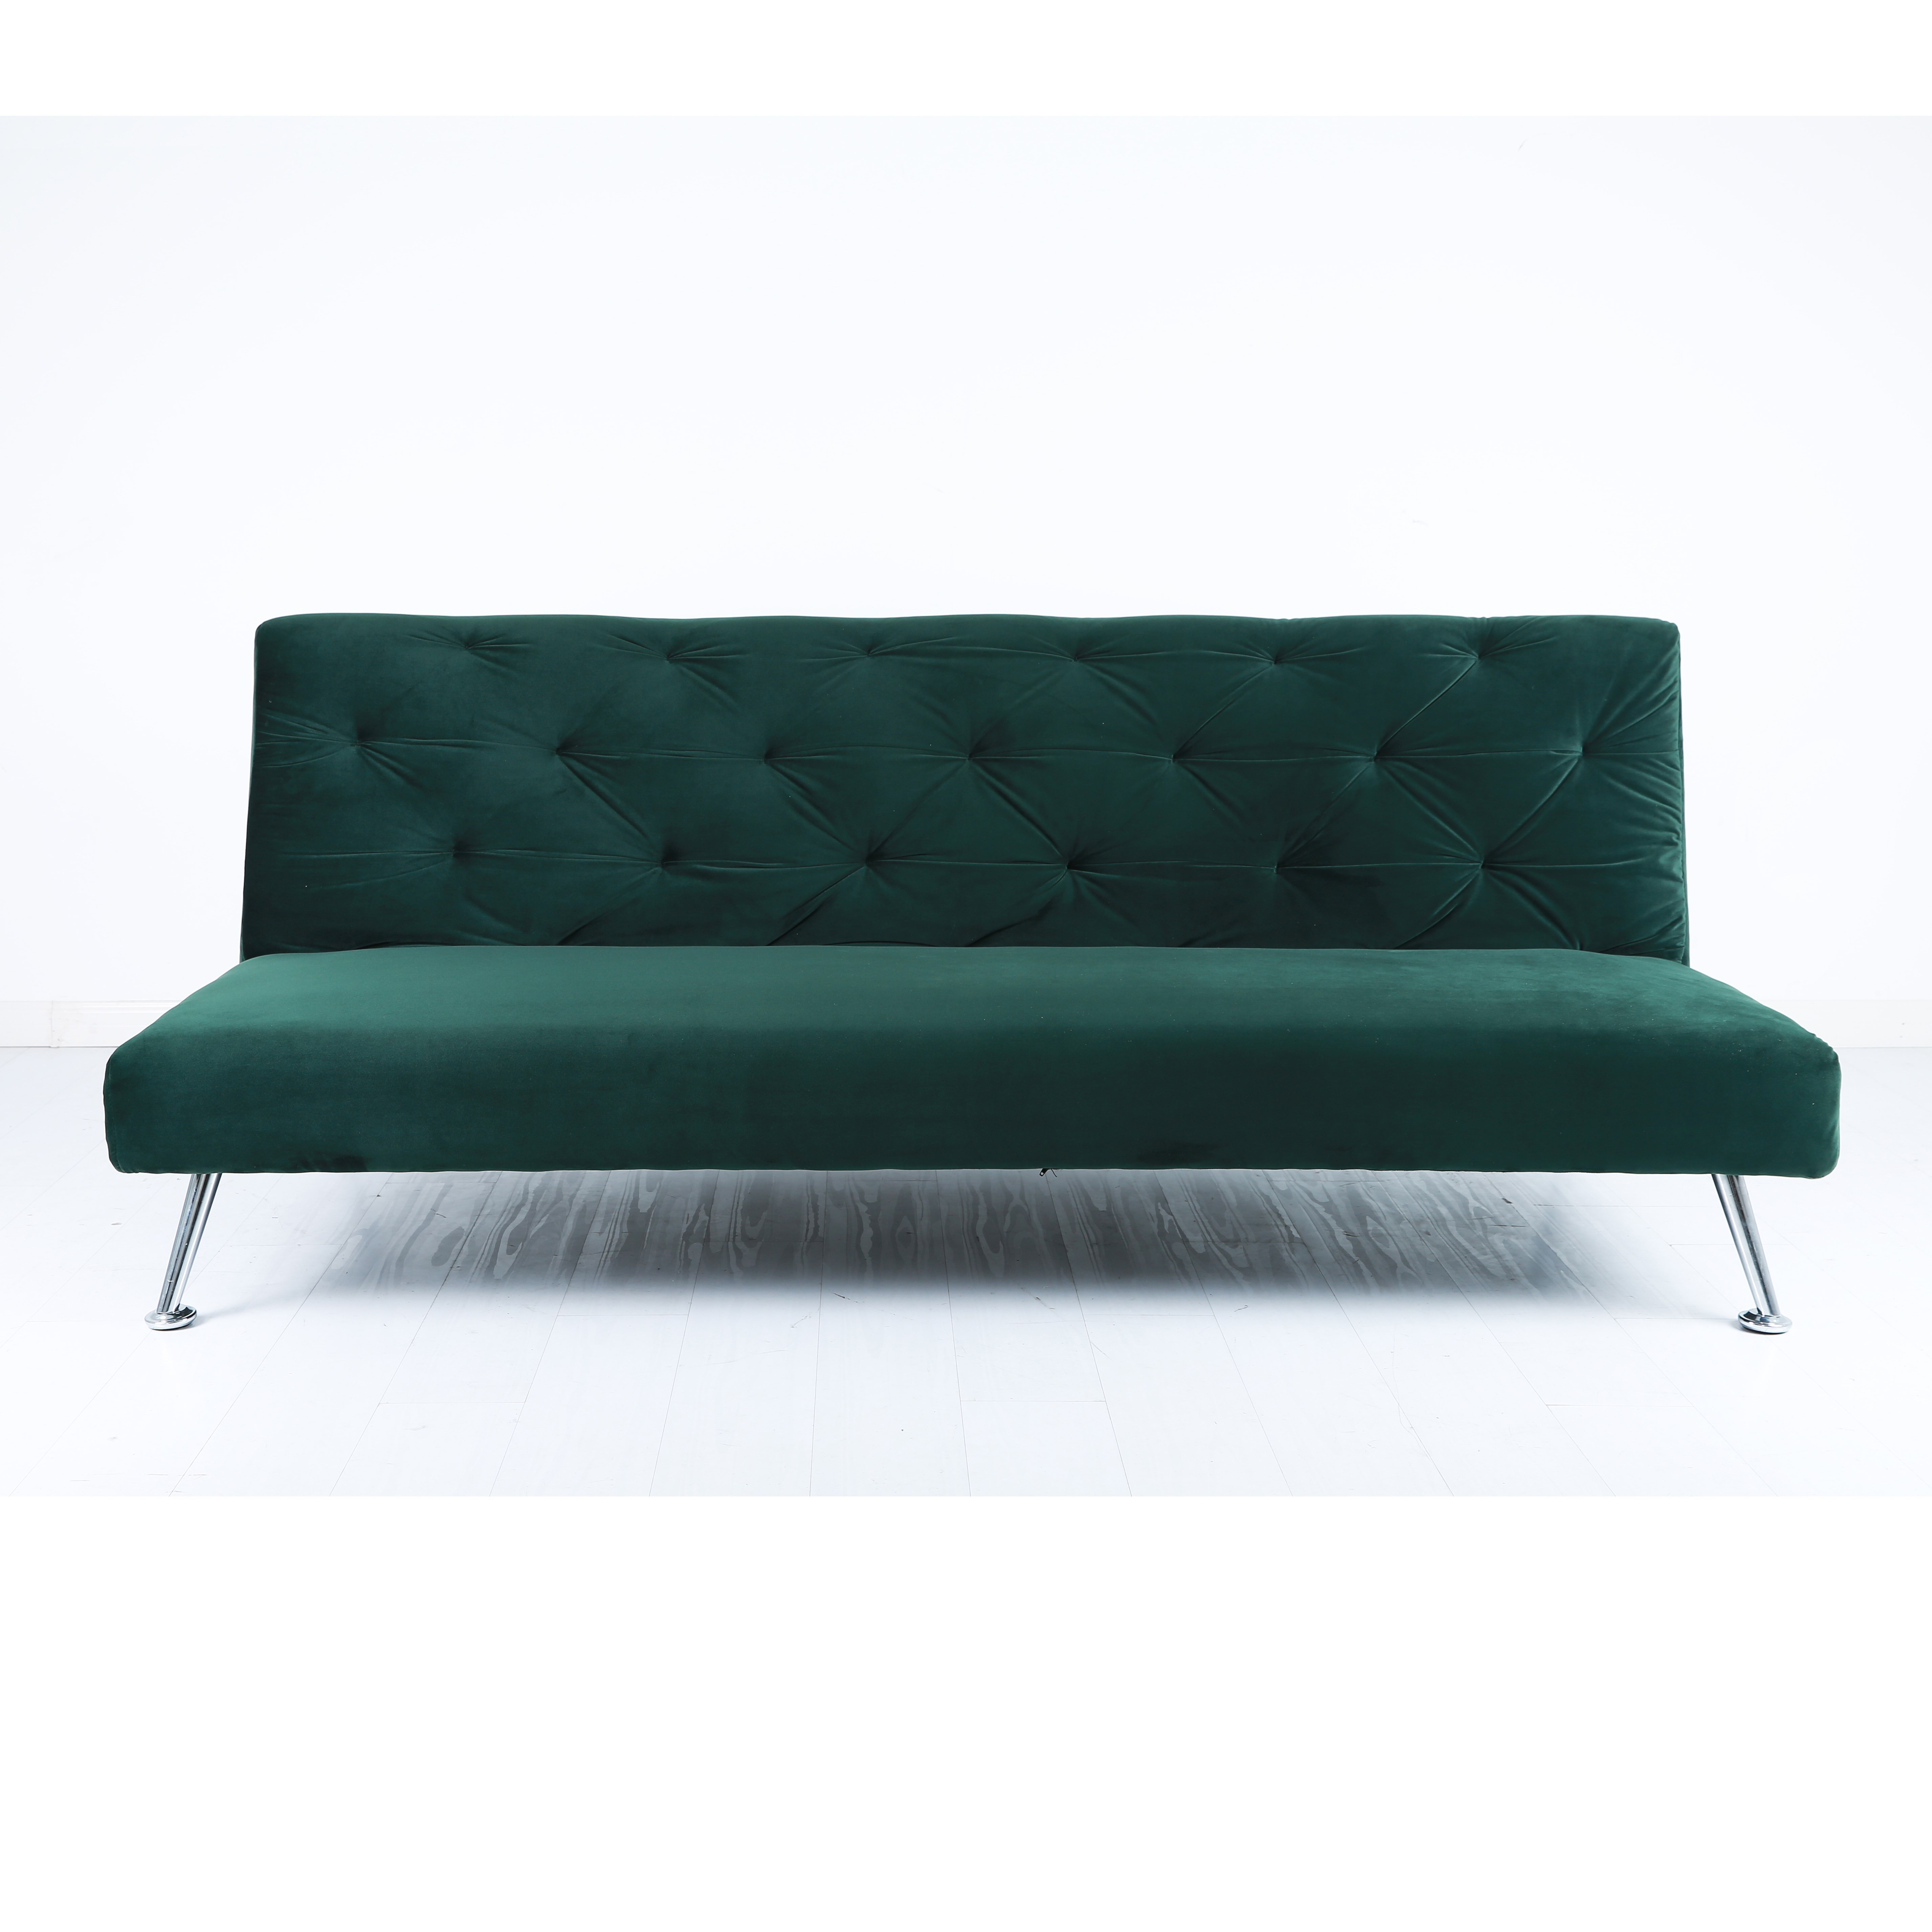 Home Furniture Living Room Sofa Bed